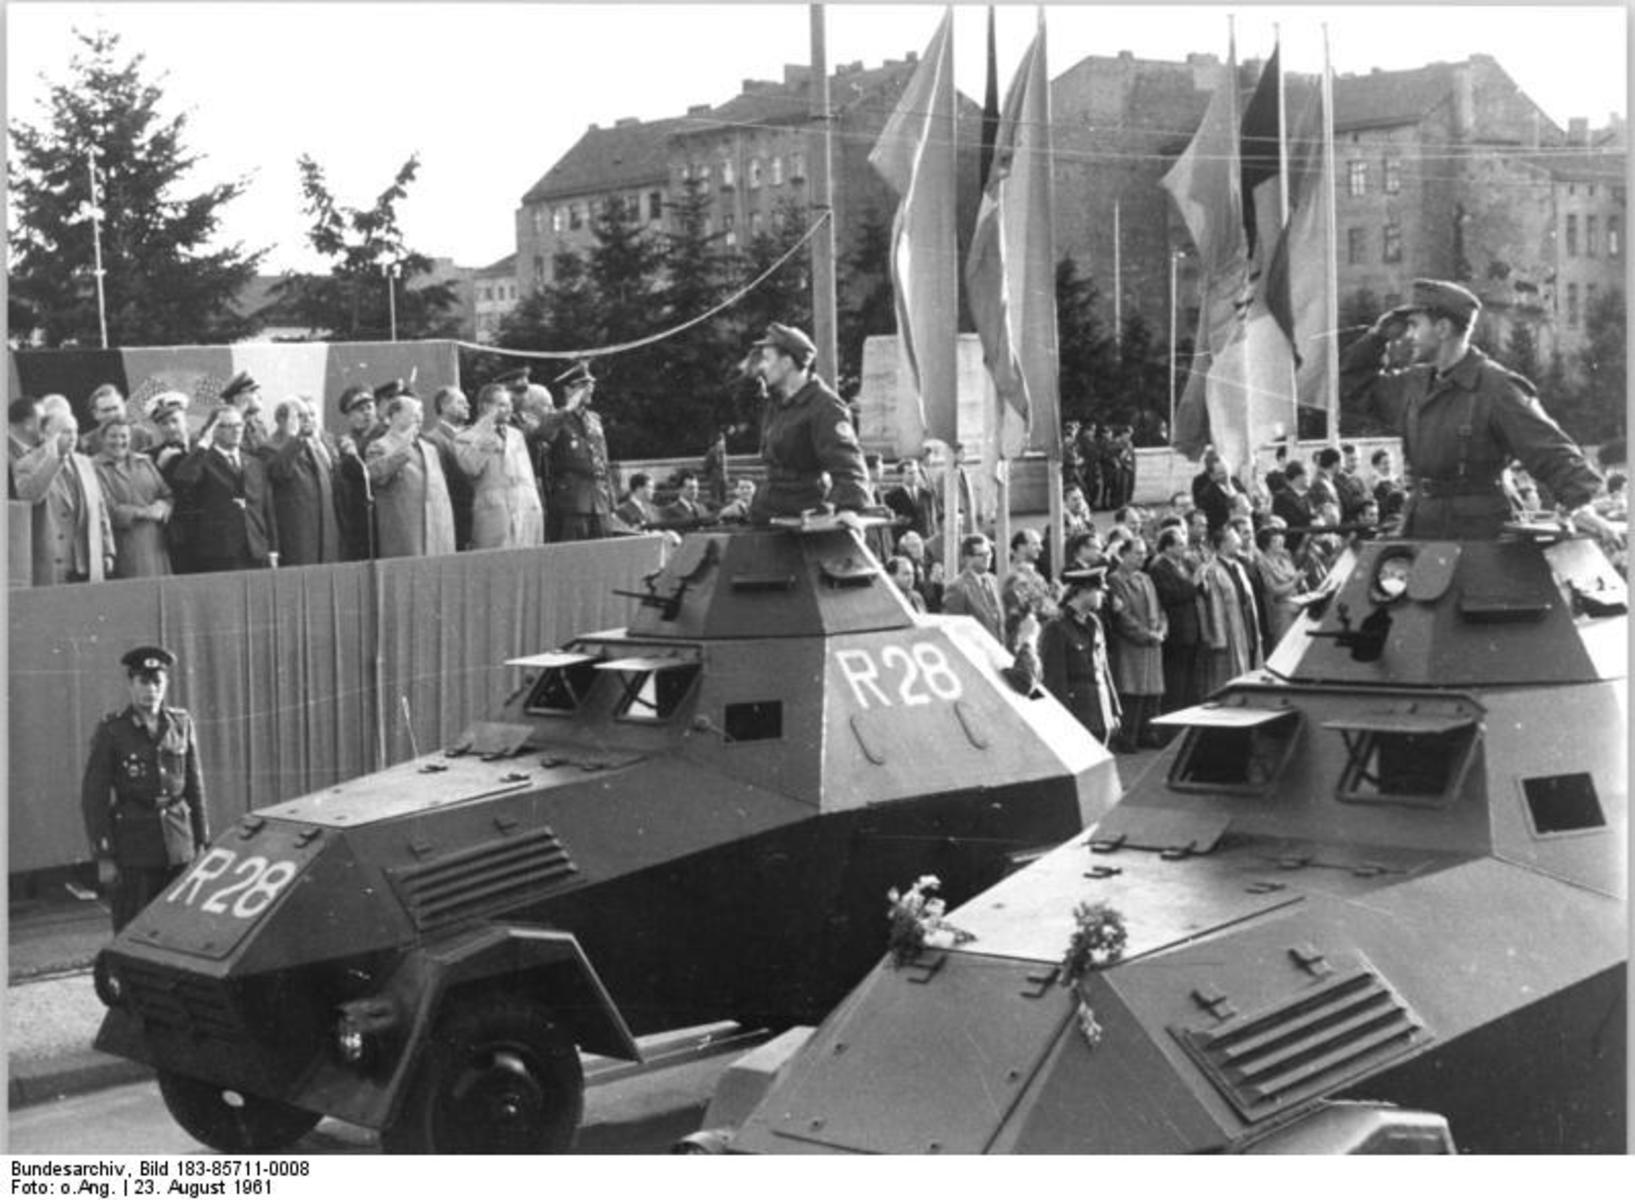 Bundesarchiv_Bild_183-85711-0008,_Berlin,_Mauerbau,_Kampfgruppen,_Appell.jpg